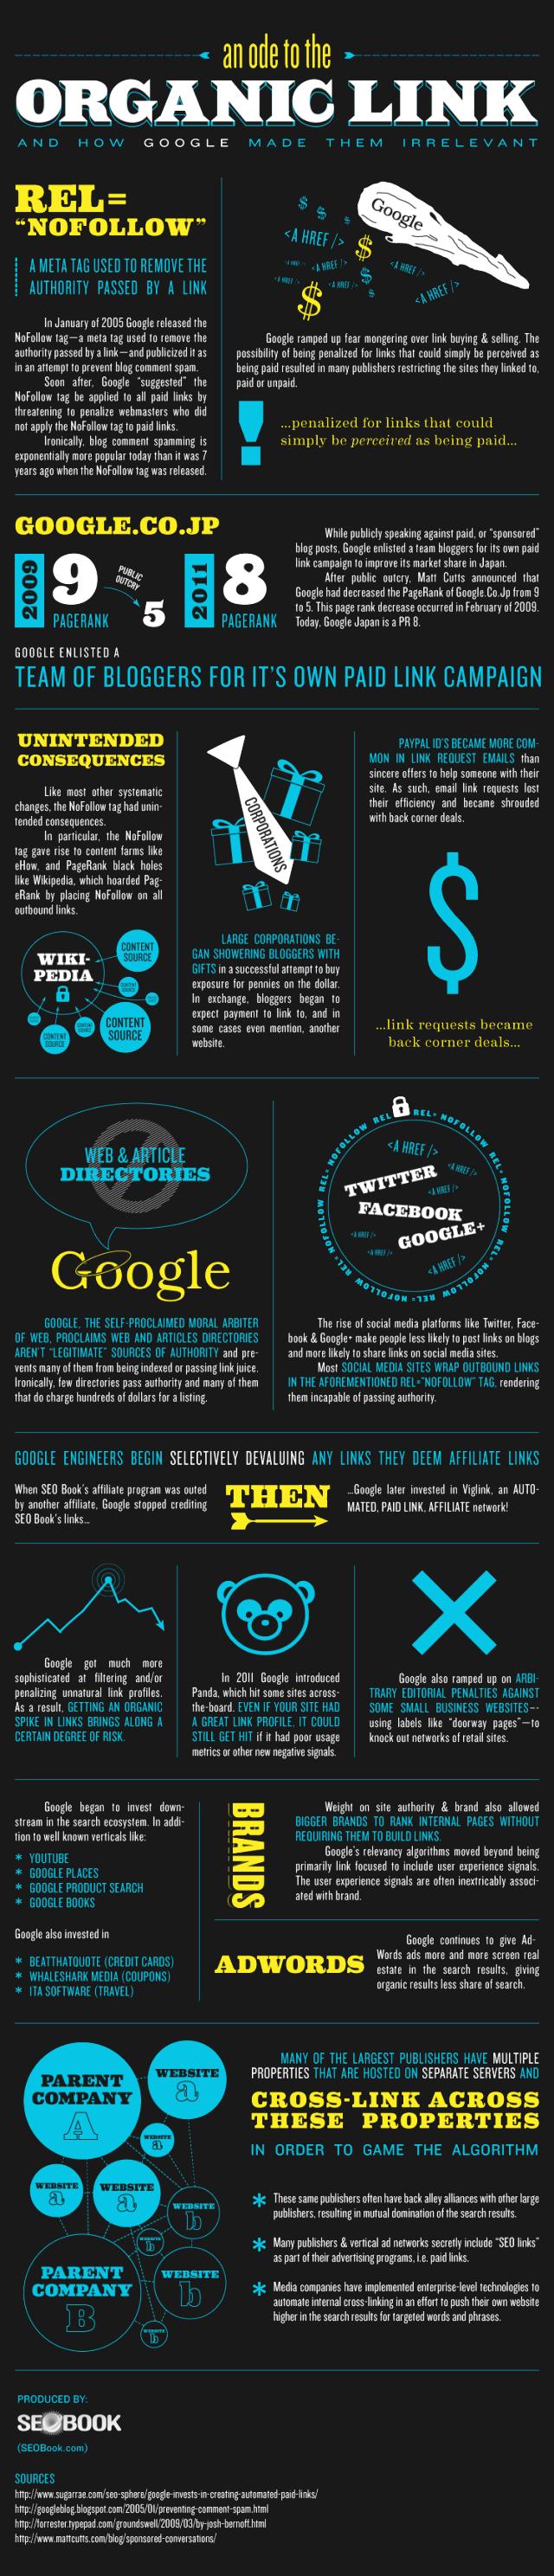 How Google Hit Organic Links.